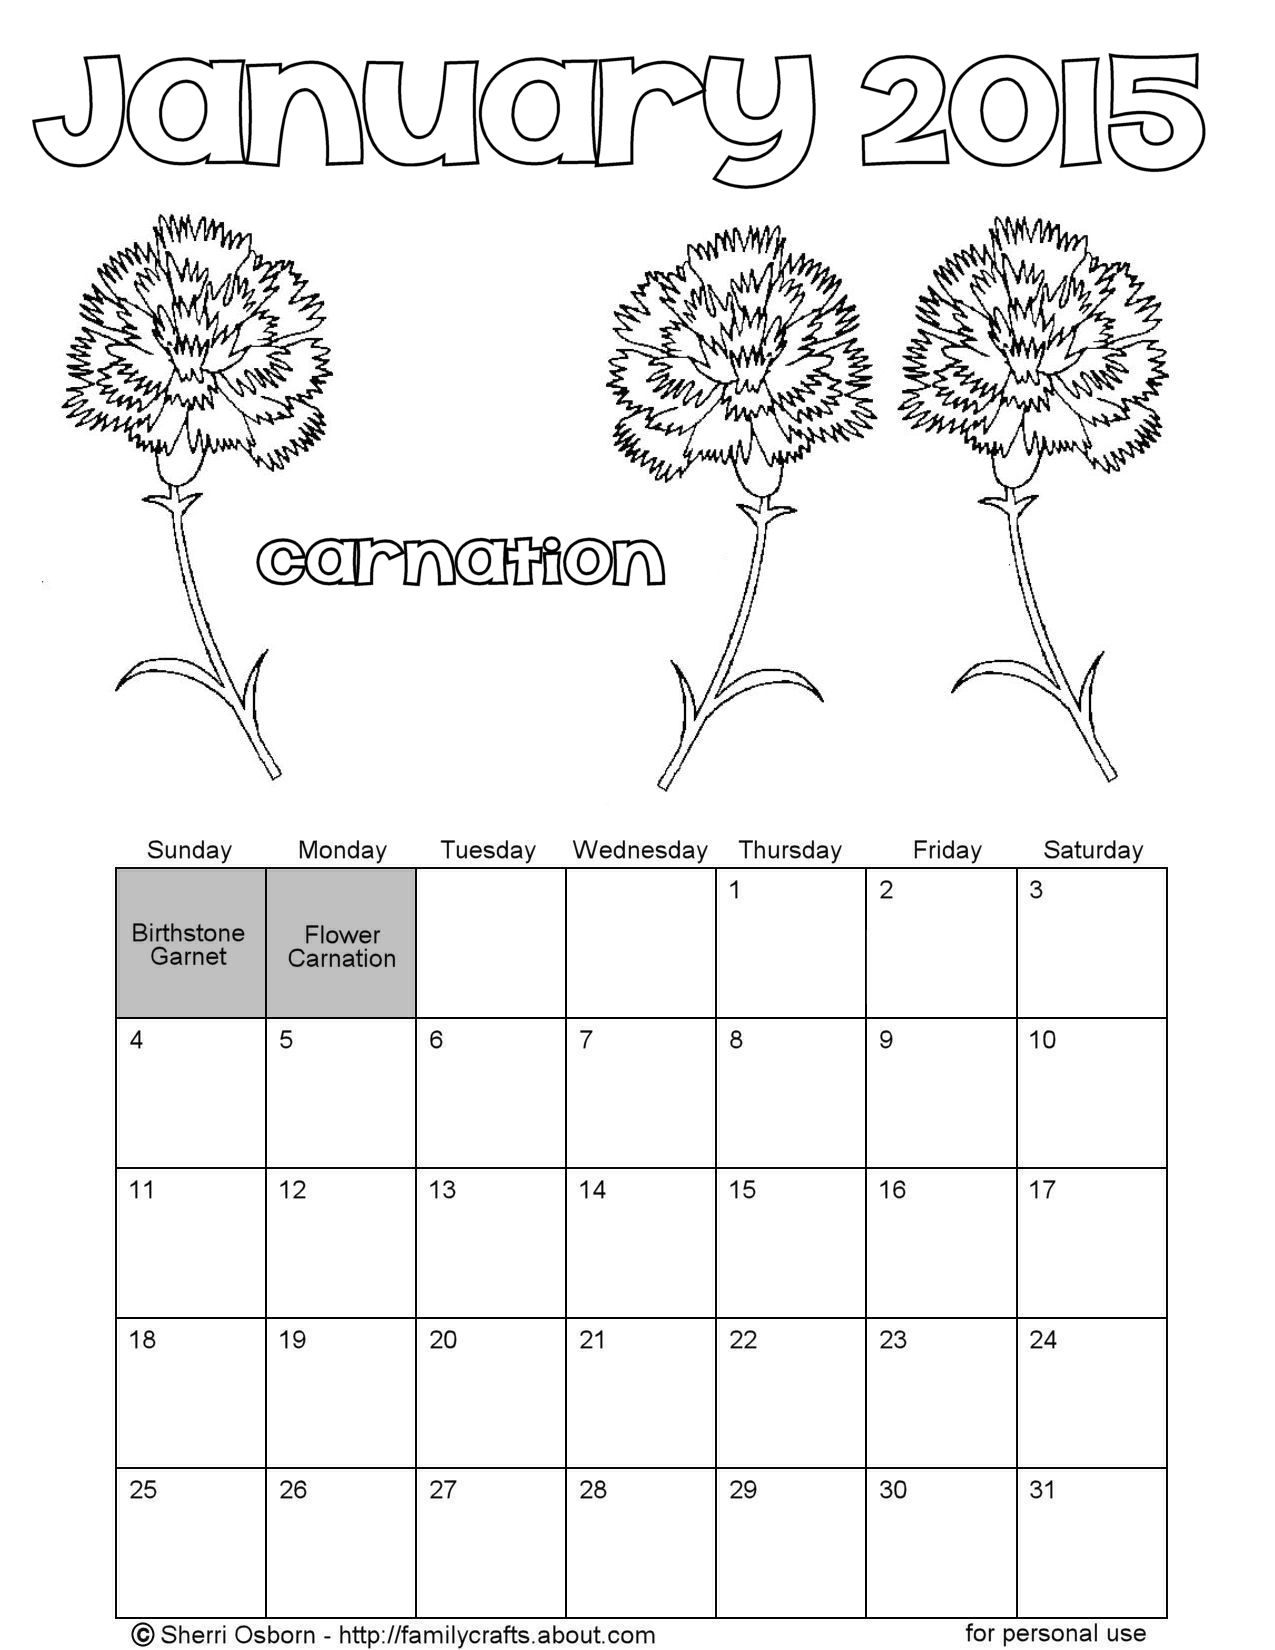 january 2015 printable calendar pages holiday favorites. Black Bedroom Furniture Sets. Home Design Ideas